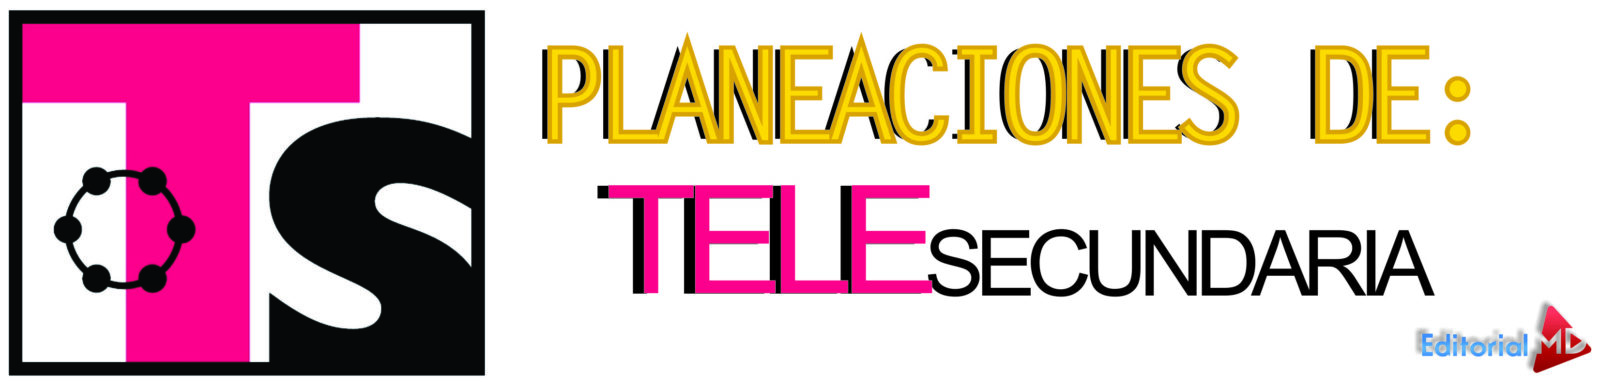 Planeaciones de telesecundaria